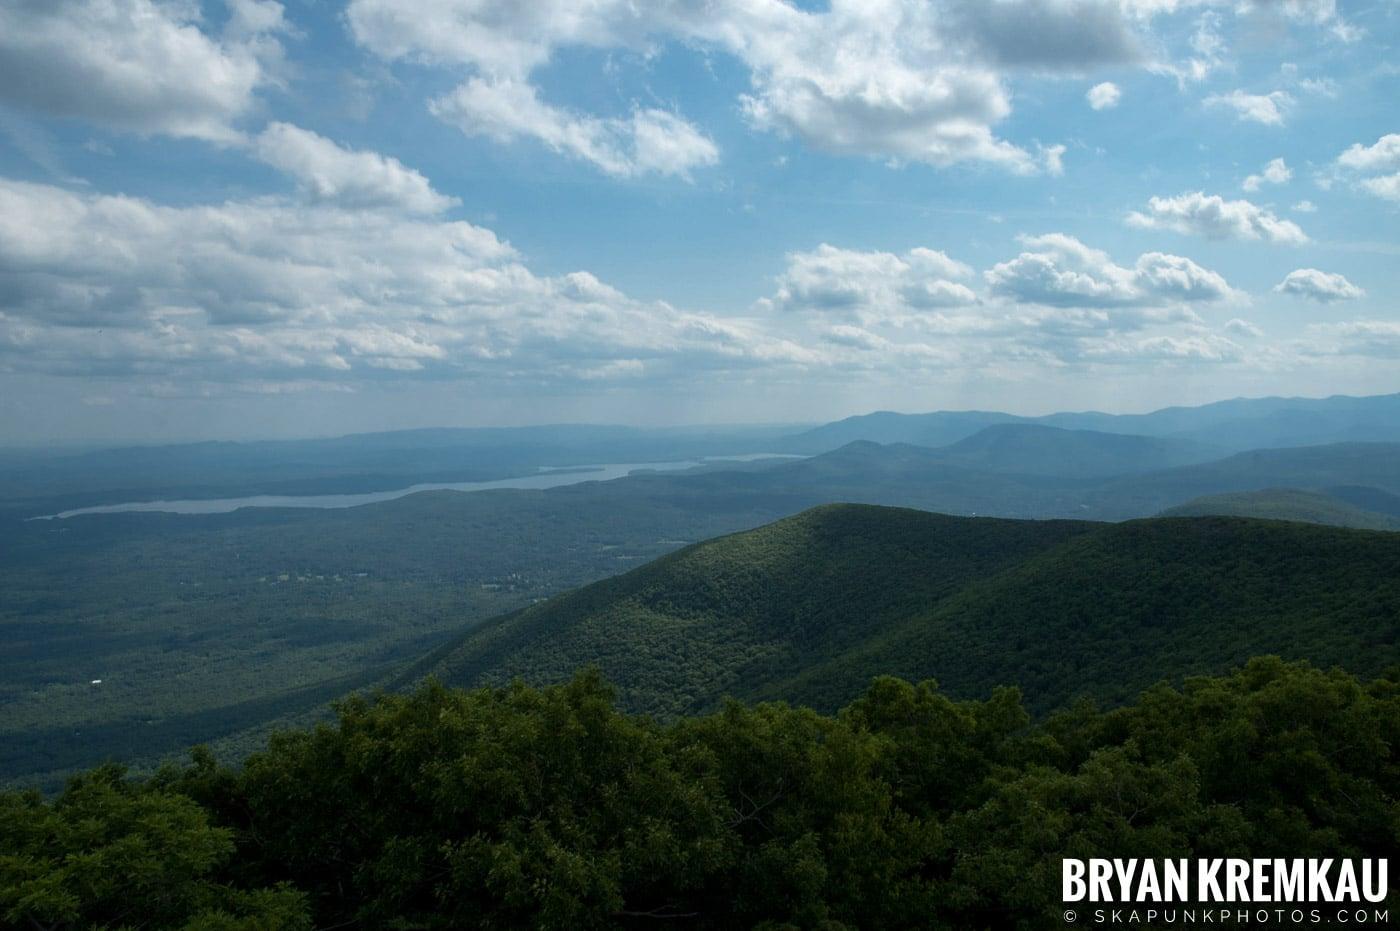 Catskills Overlook Mountain @ Woodstock, NY - 6.24.07 (7)